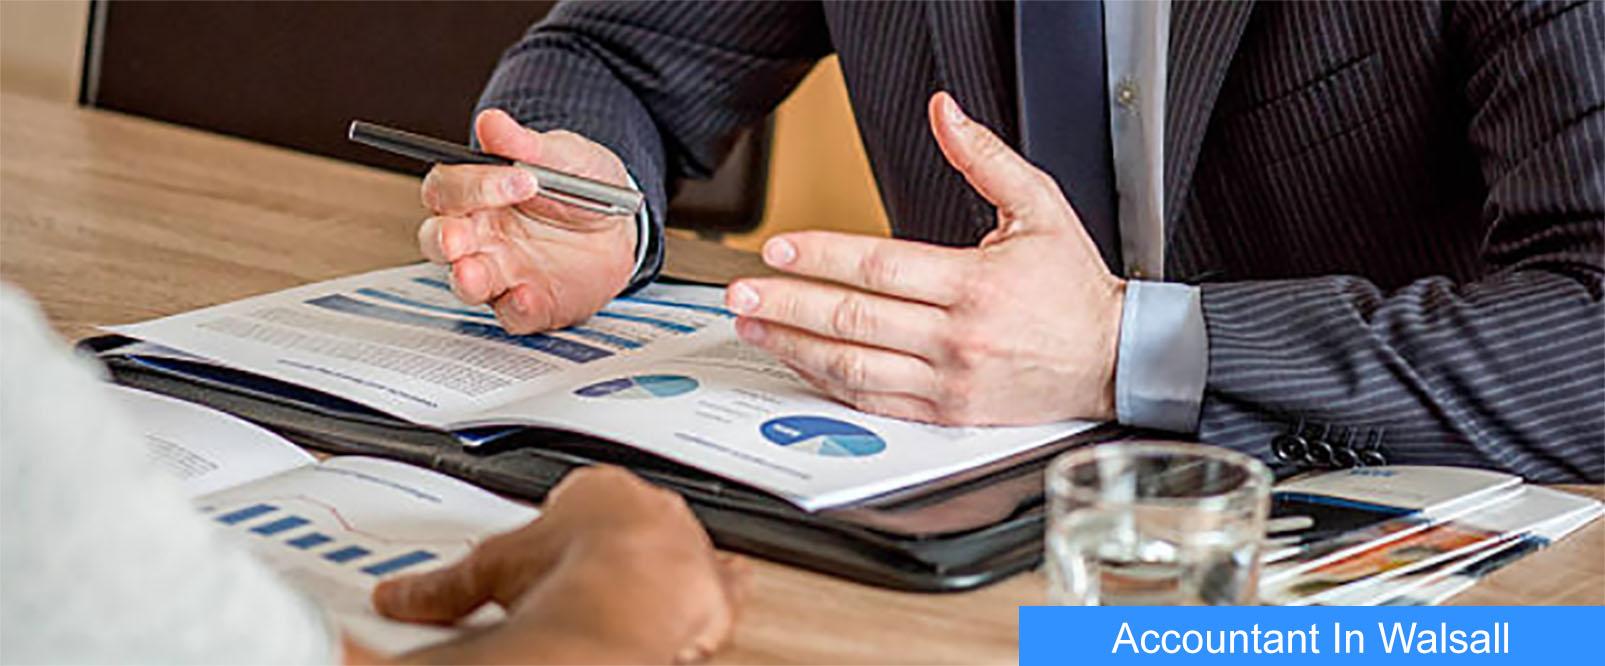 accountancy company, accountant company, services